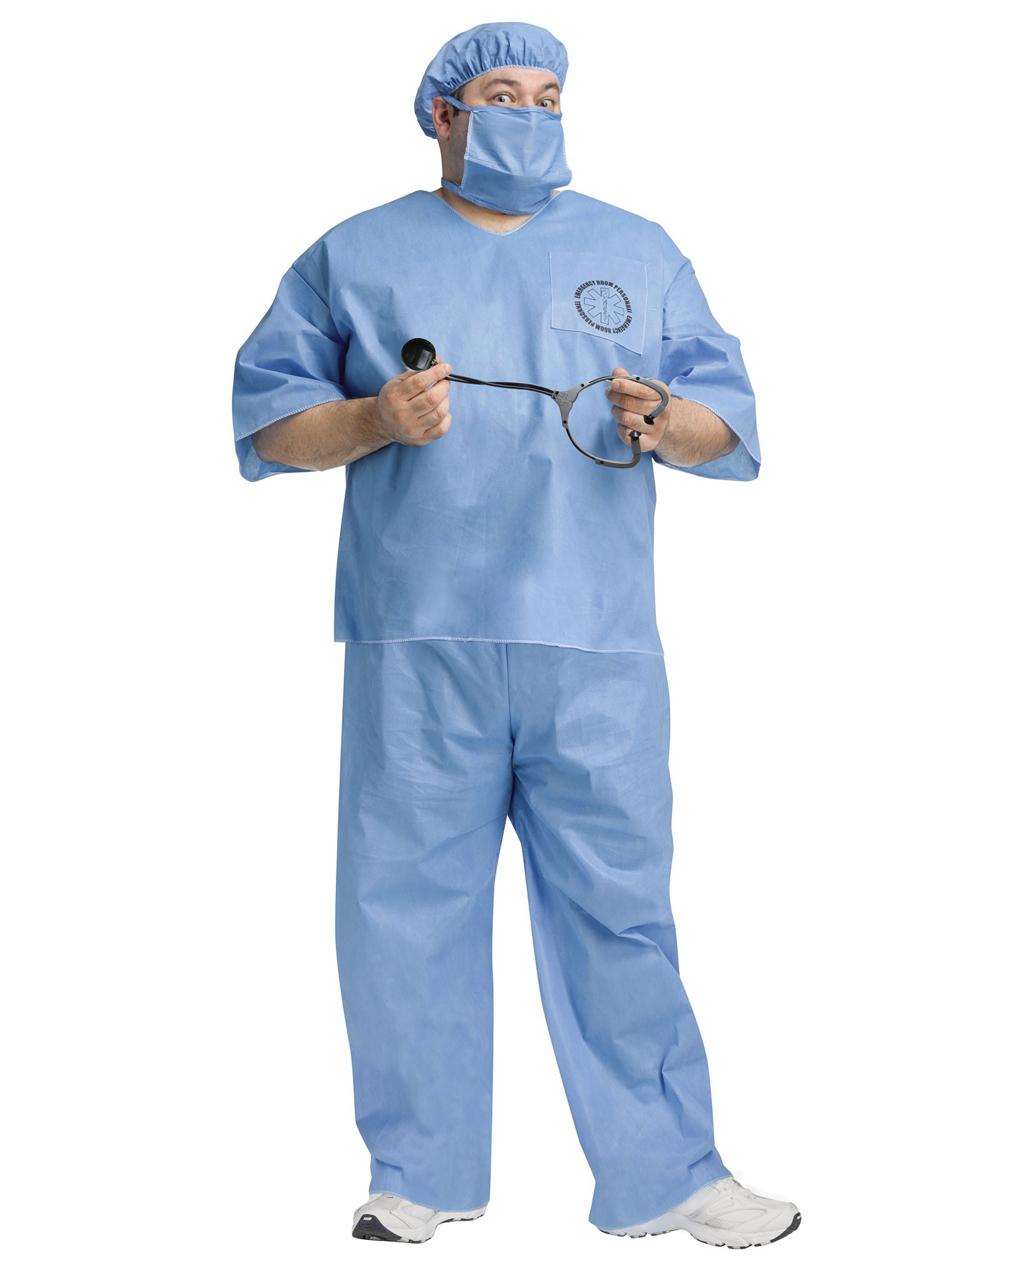 OP Doctor Costume Plus Size for Halloween | horror-shop.com